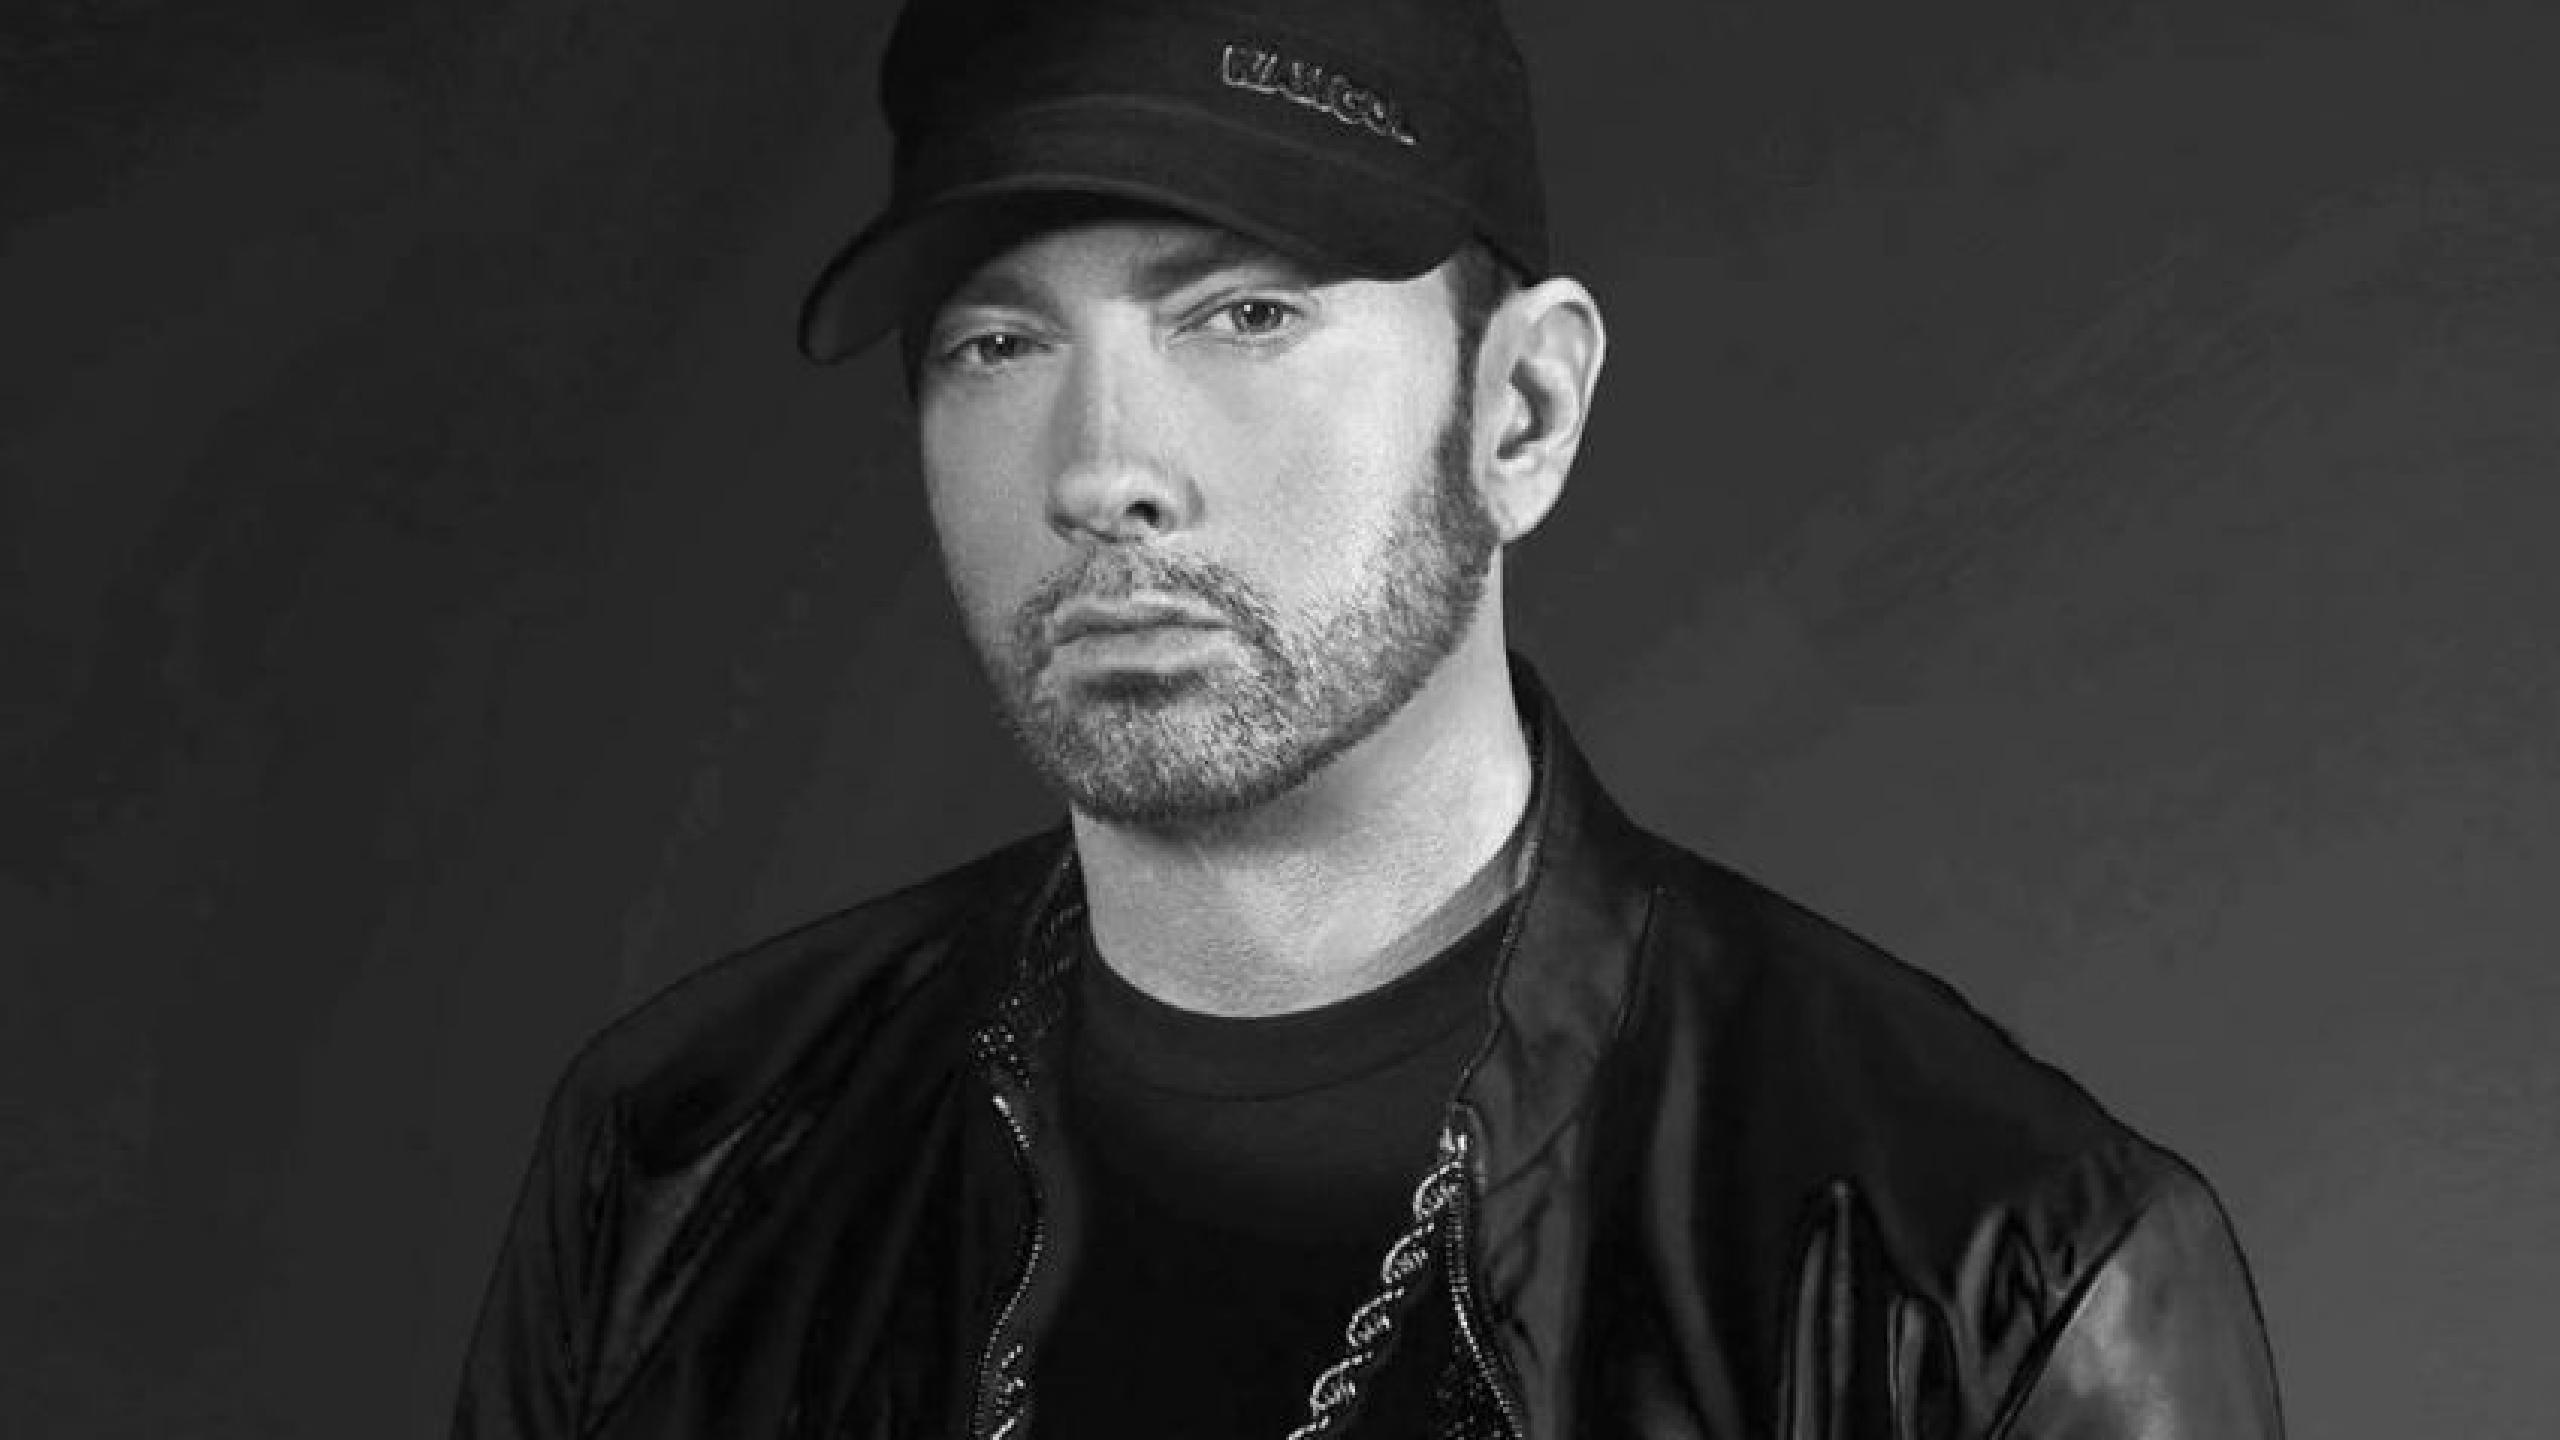 Eminem Tour 2020.Eminem Tour Dates 2019 2020 Eminem Tickets And Concerts